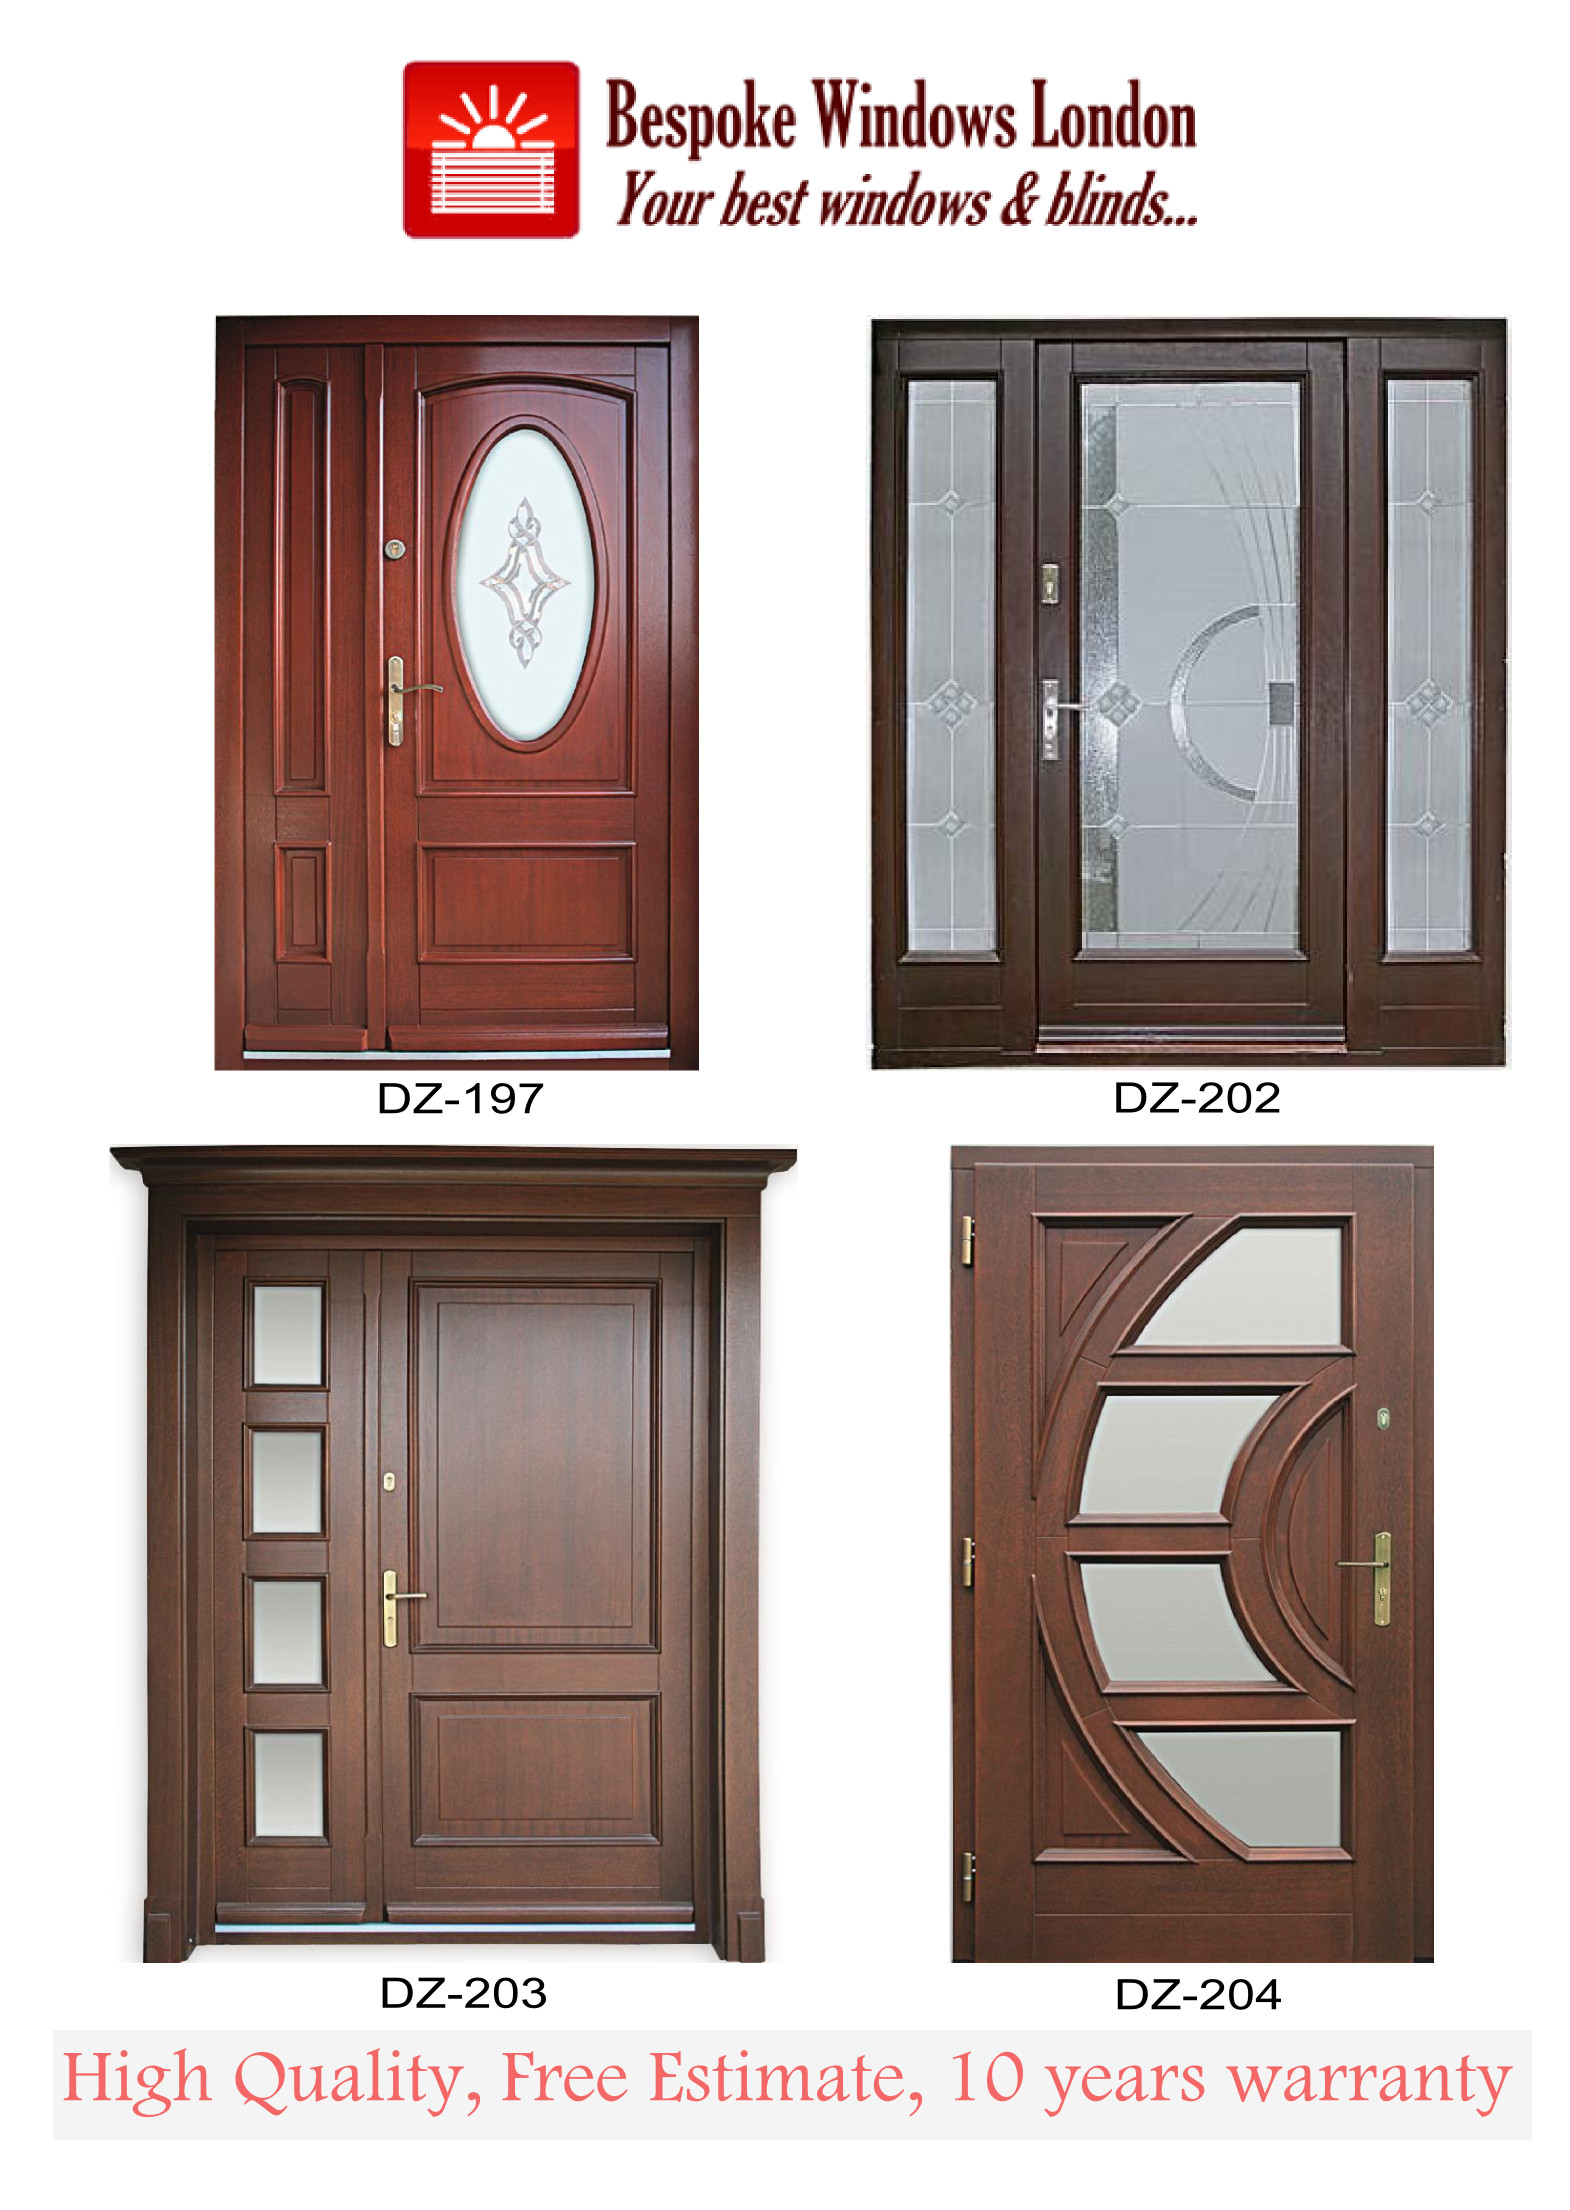 2210 #C40B07 Windows London – Wooden / Timber Doors And Windows London » Online  picture/photo Online Doors And Windows 29391570